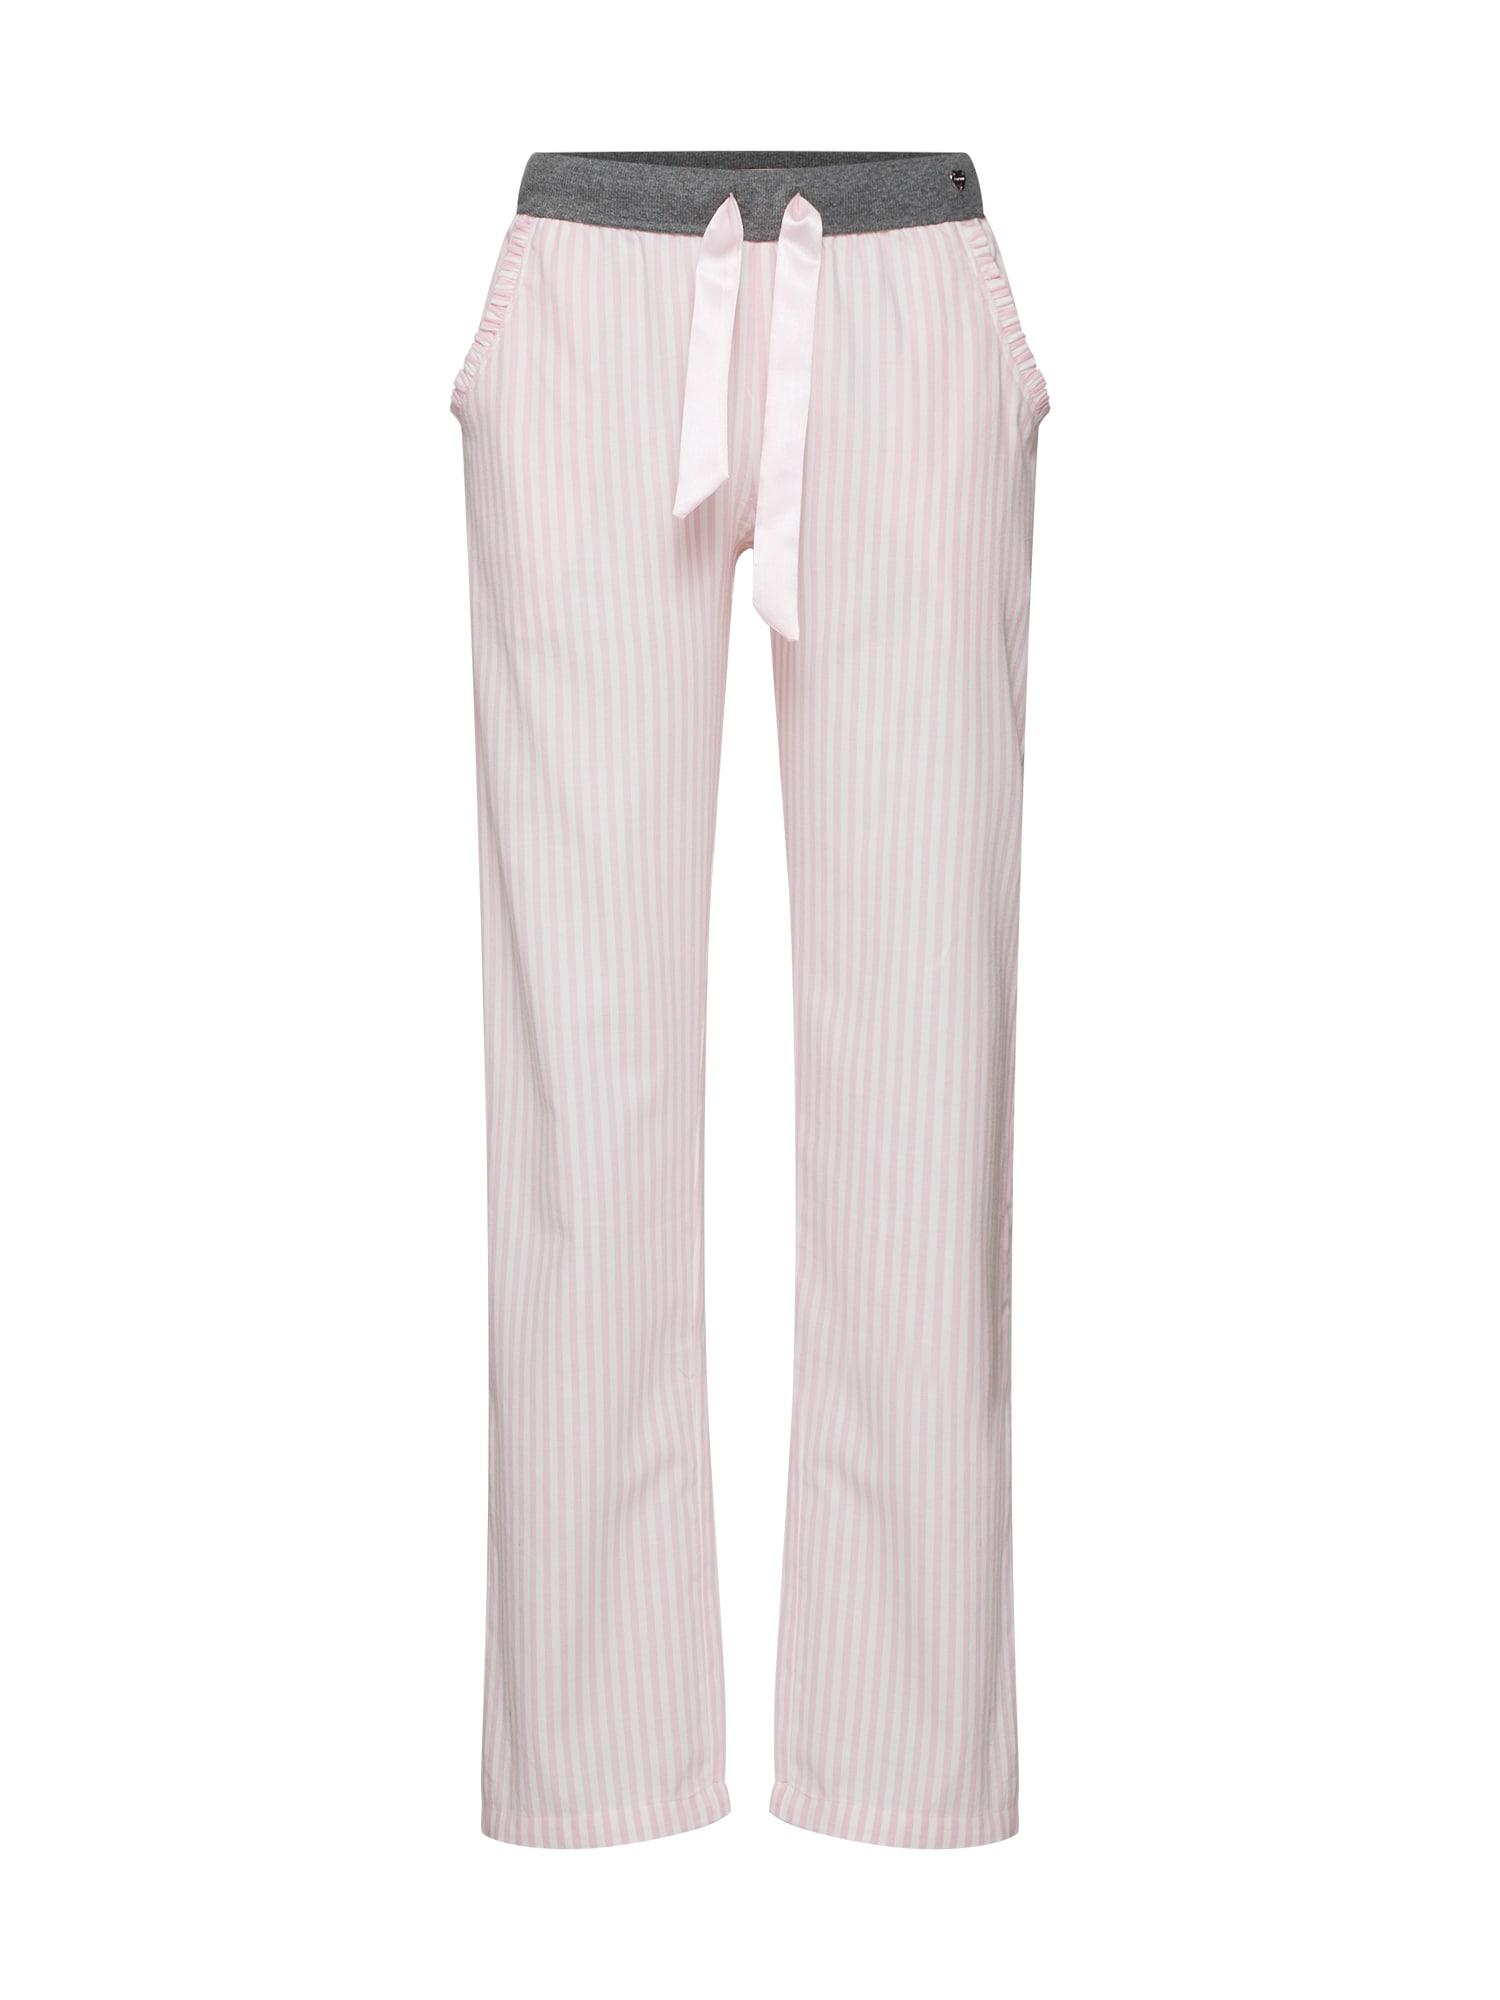 Pyžamové kalhoty CALISTA CAS NW růže ESPRIT